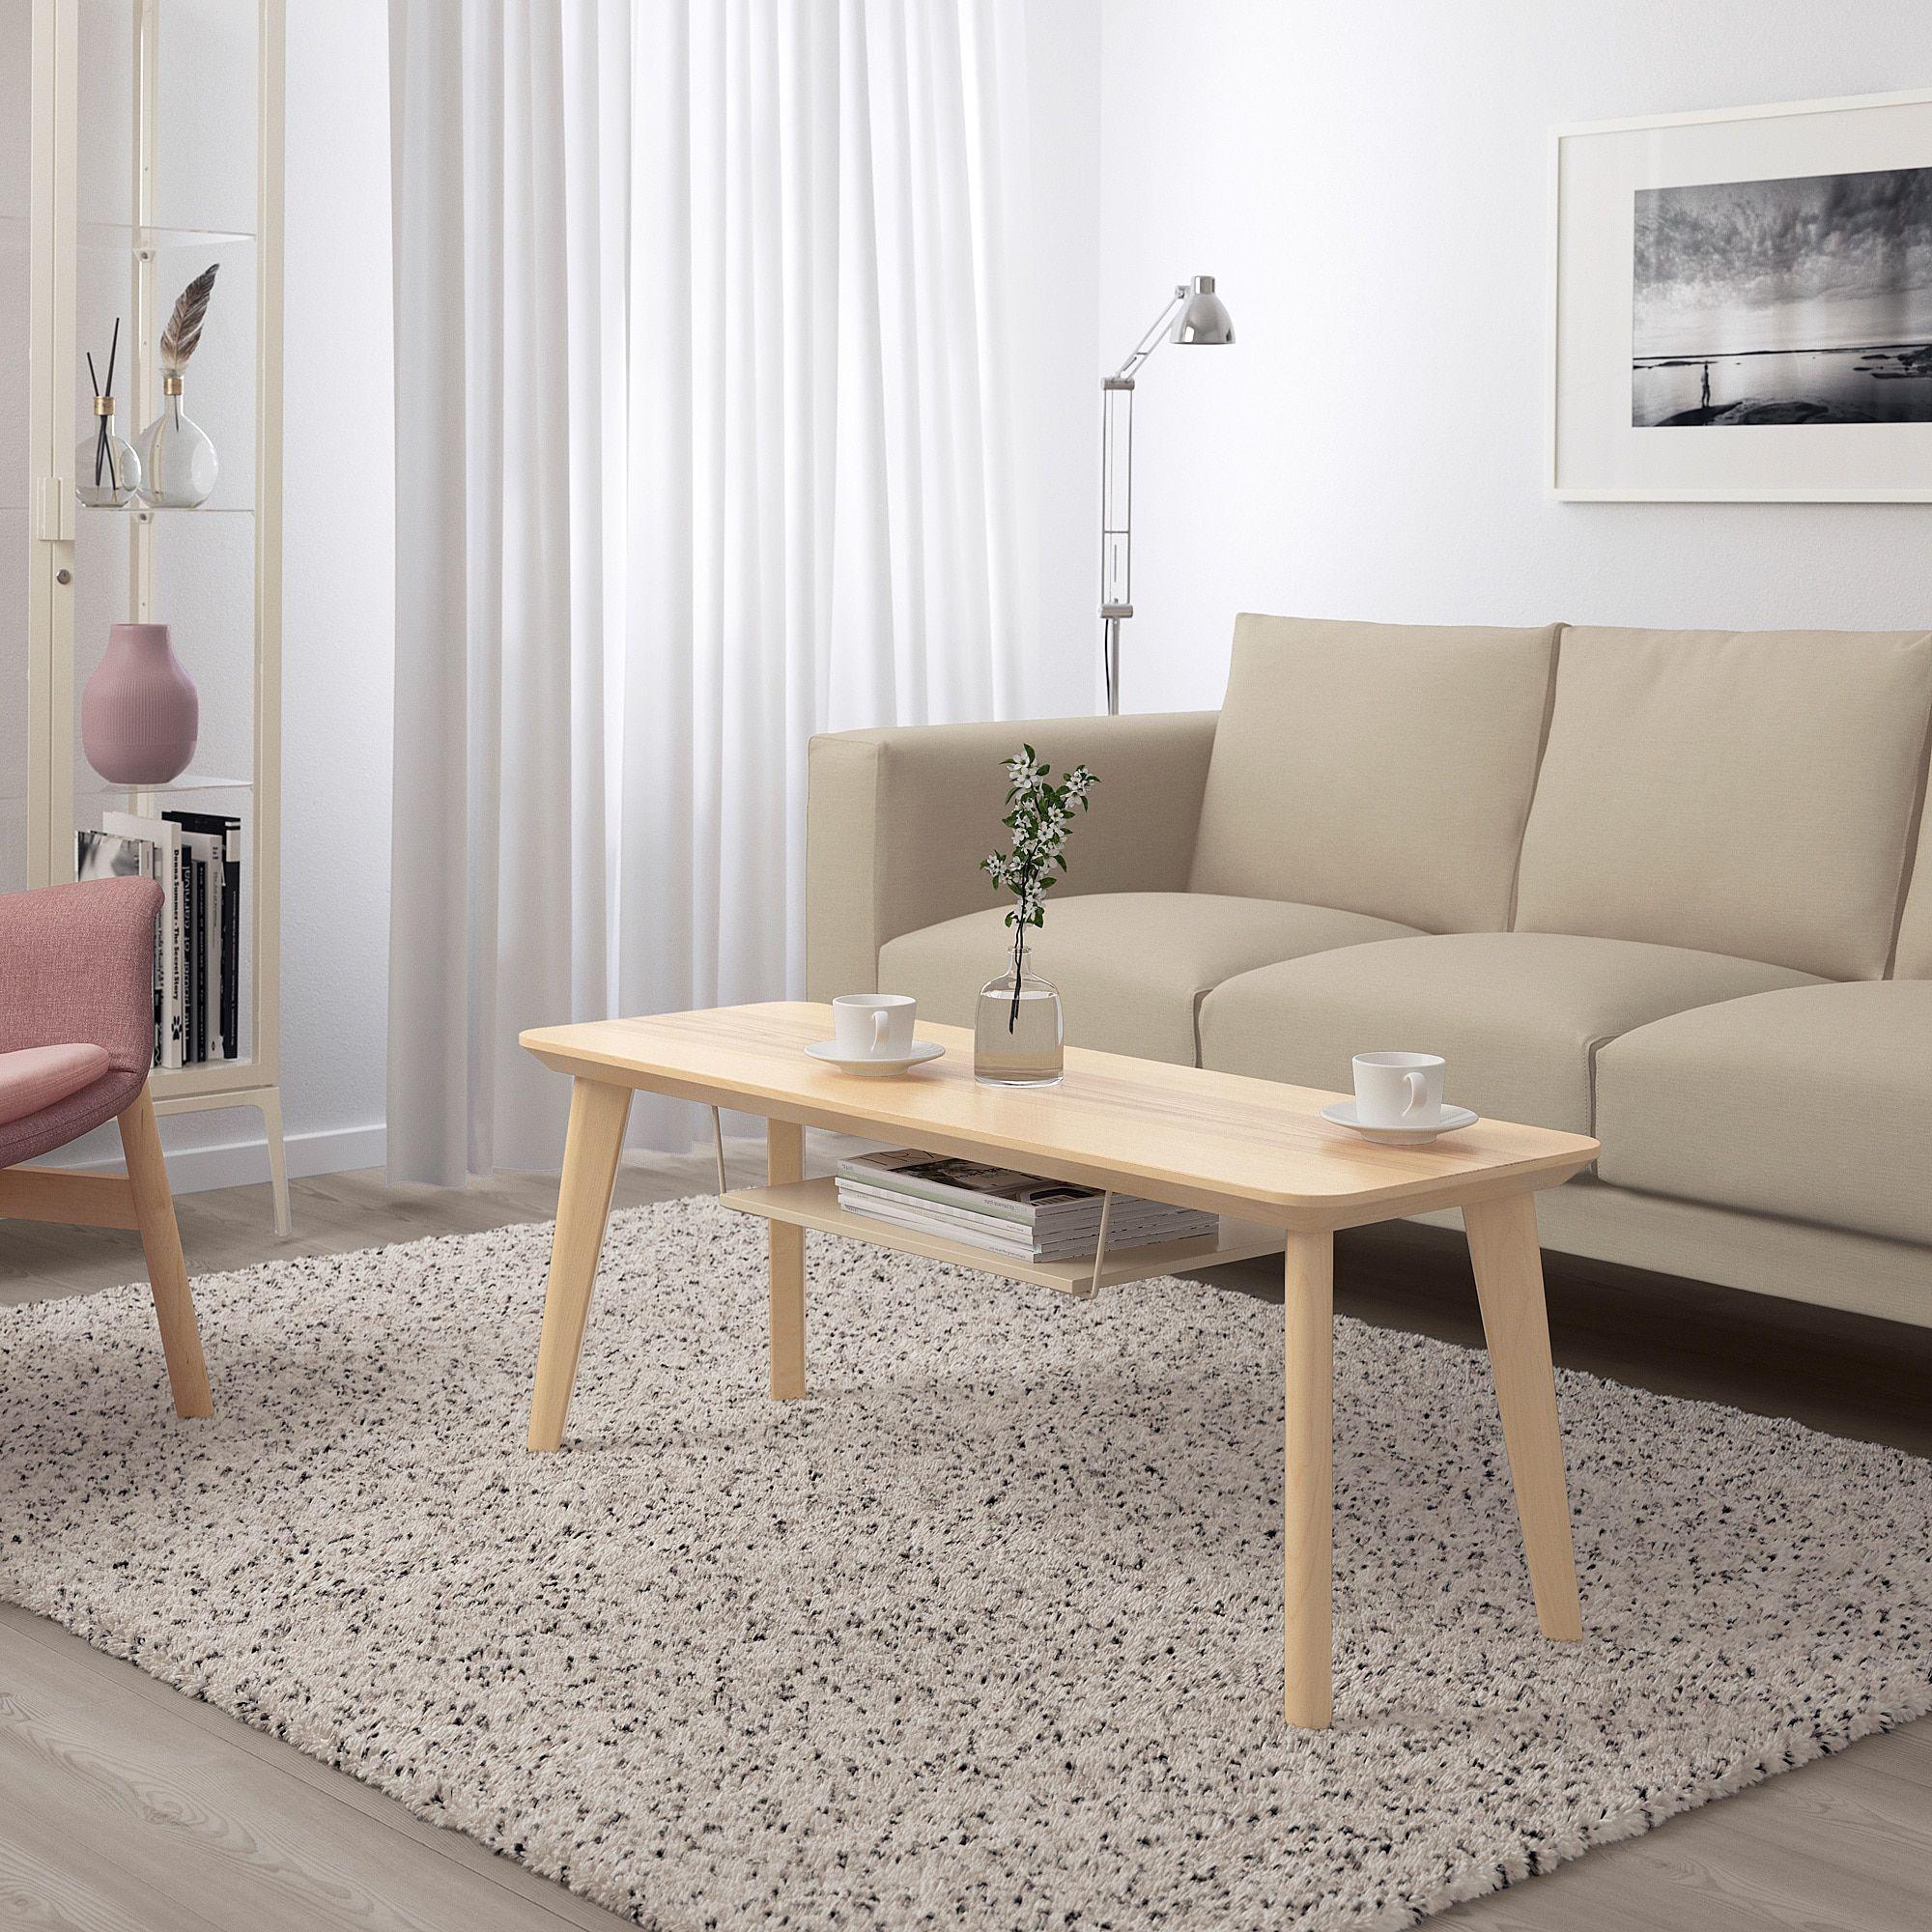 Ikea Lisabo Tv Bench Ash Veneer Tv Bench Ikea Home Furnishings [ 2000 x 2000 Pixel ]